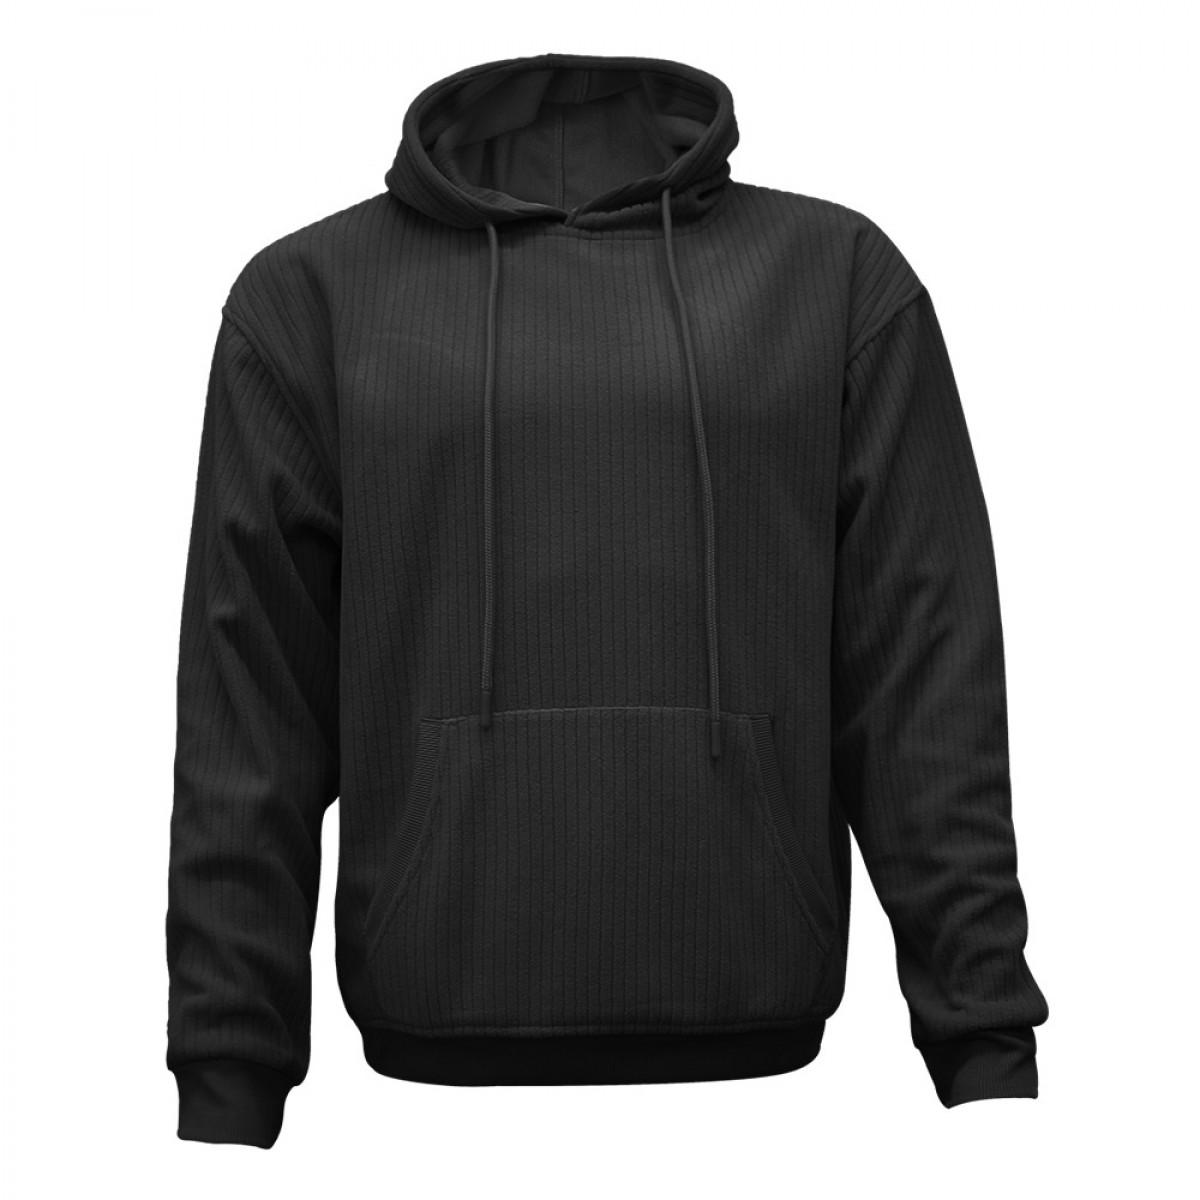 men-fleece-full-hoodie-kfh05906-8a